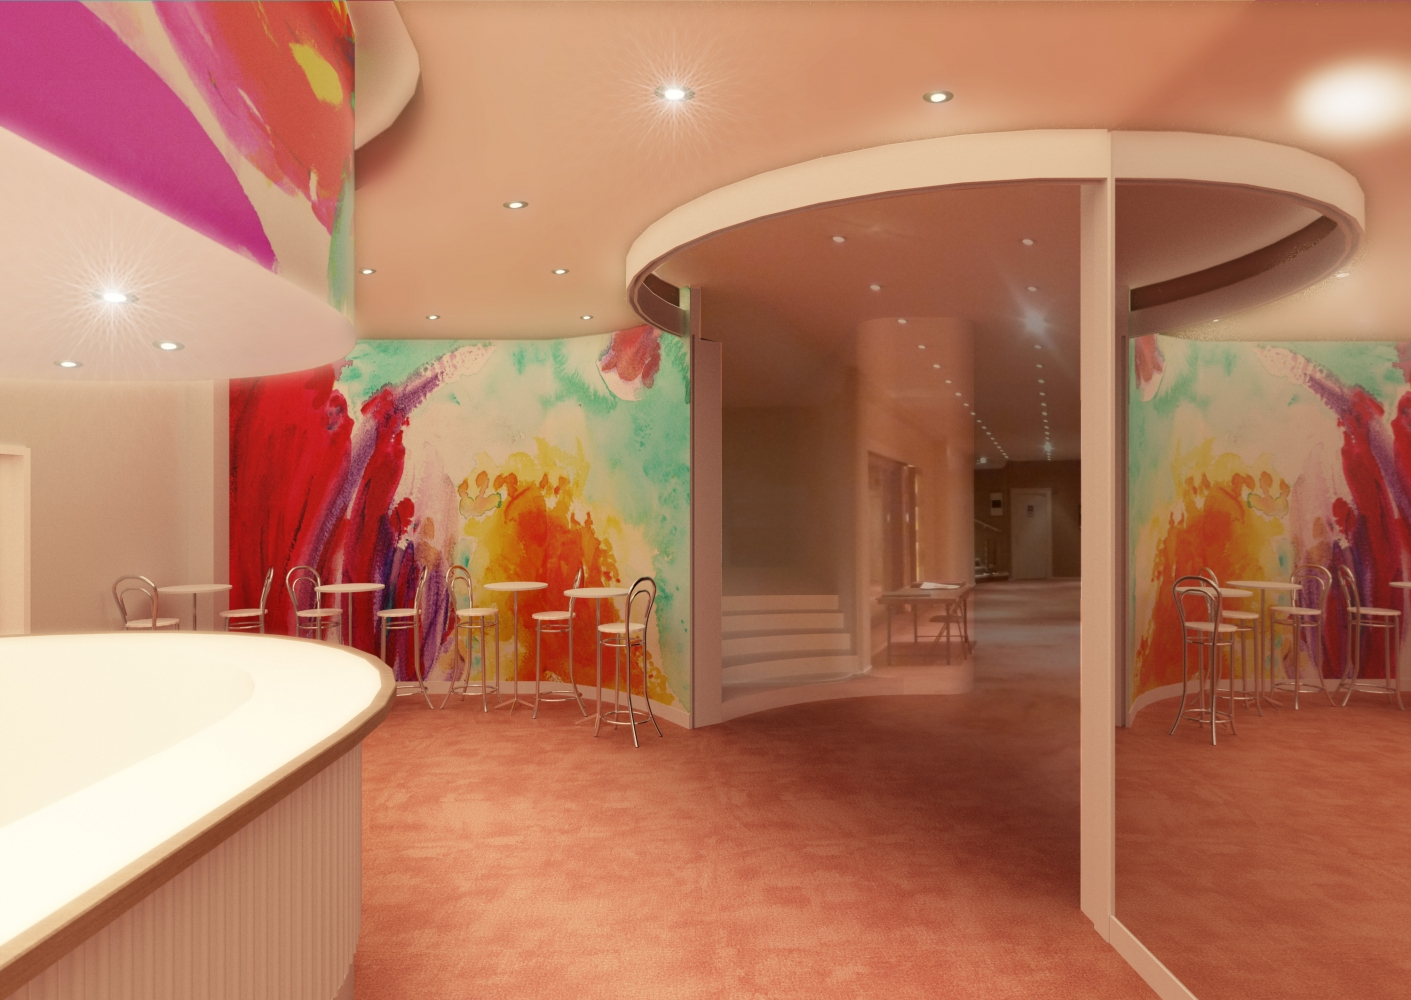 04-poissy-img-000-et-001 Pascale SEURIN Architecte - Peintures